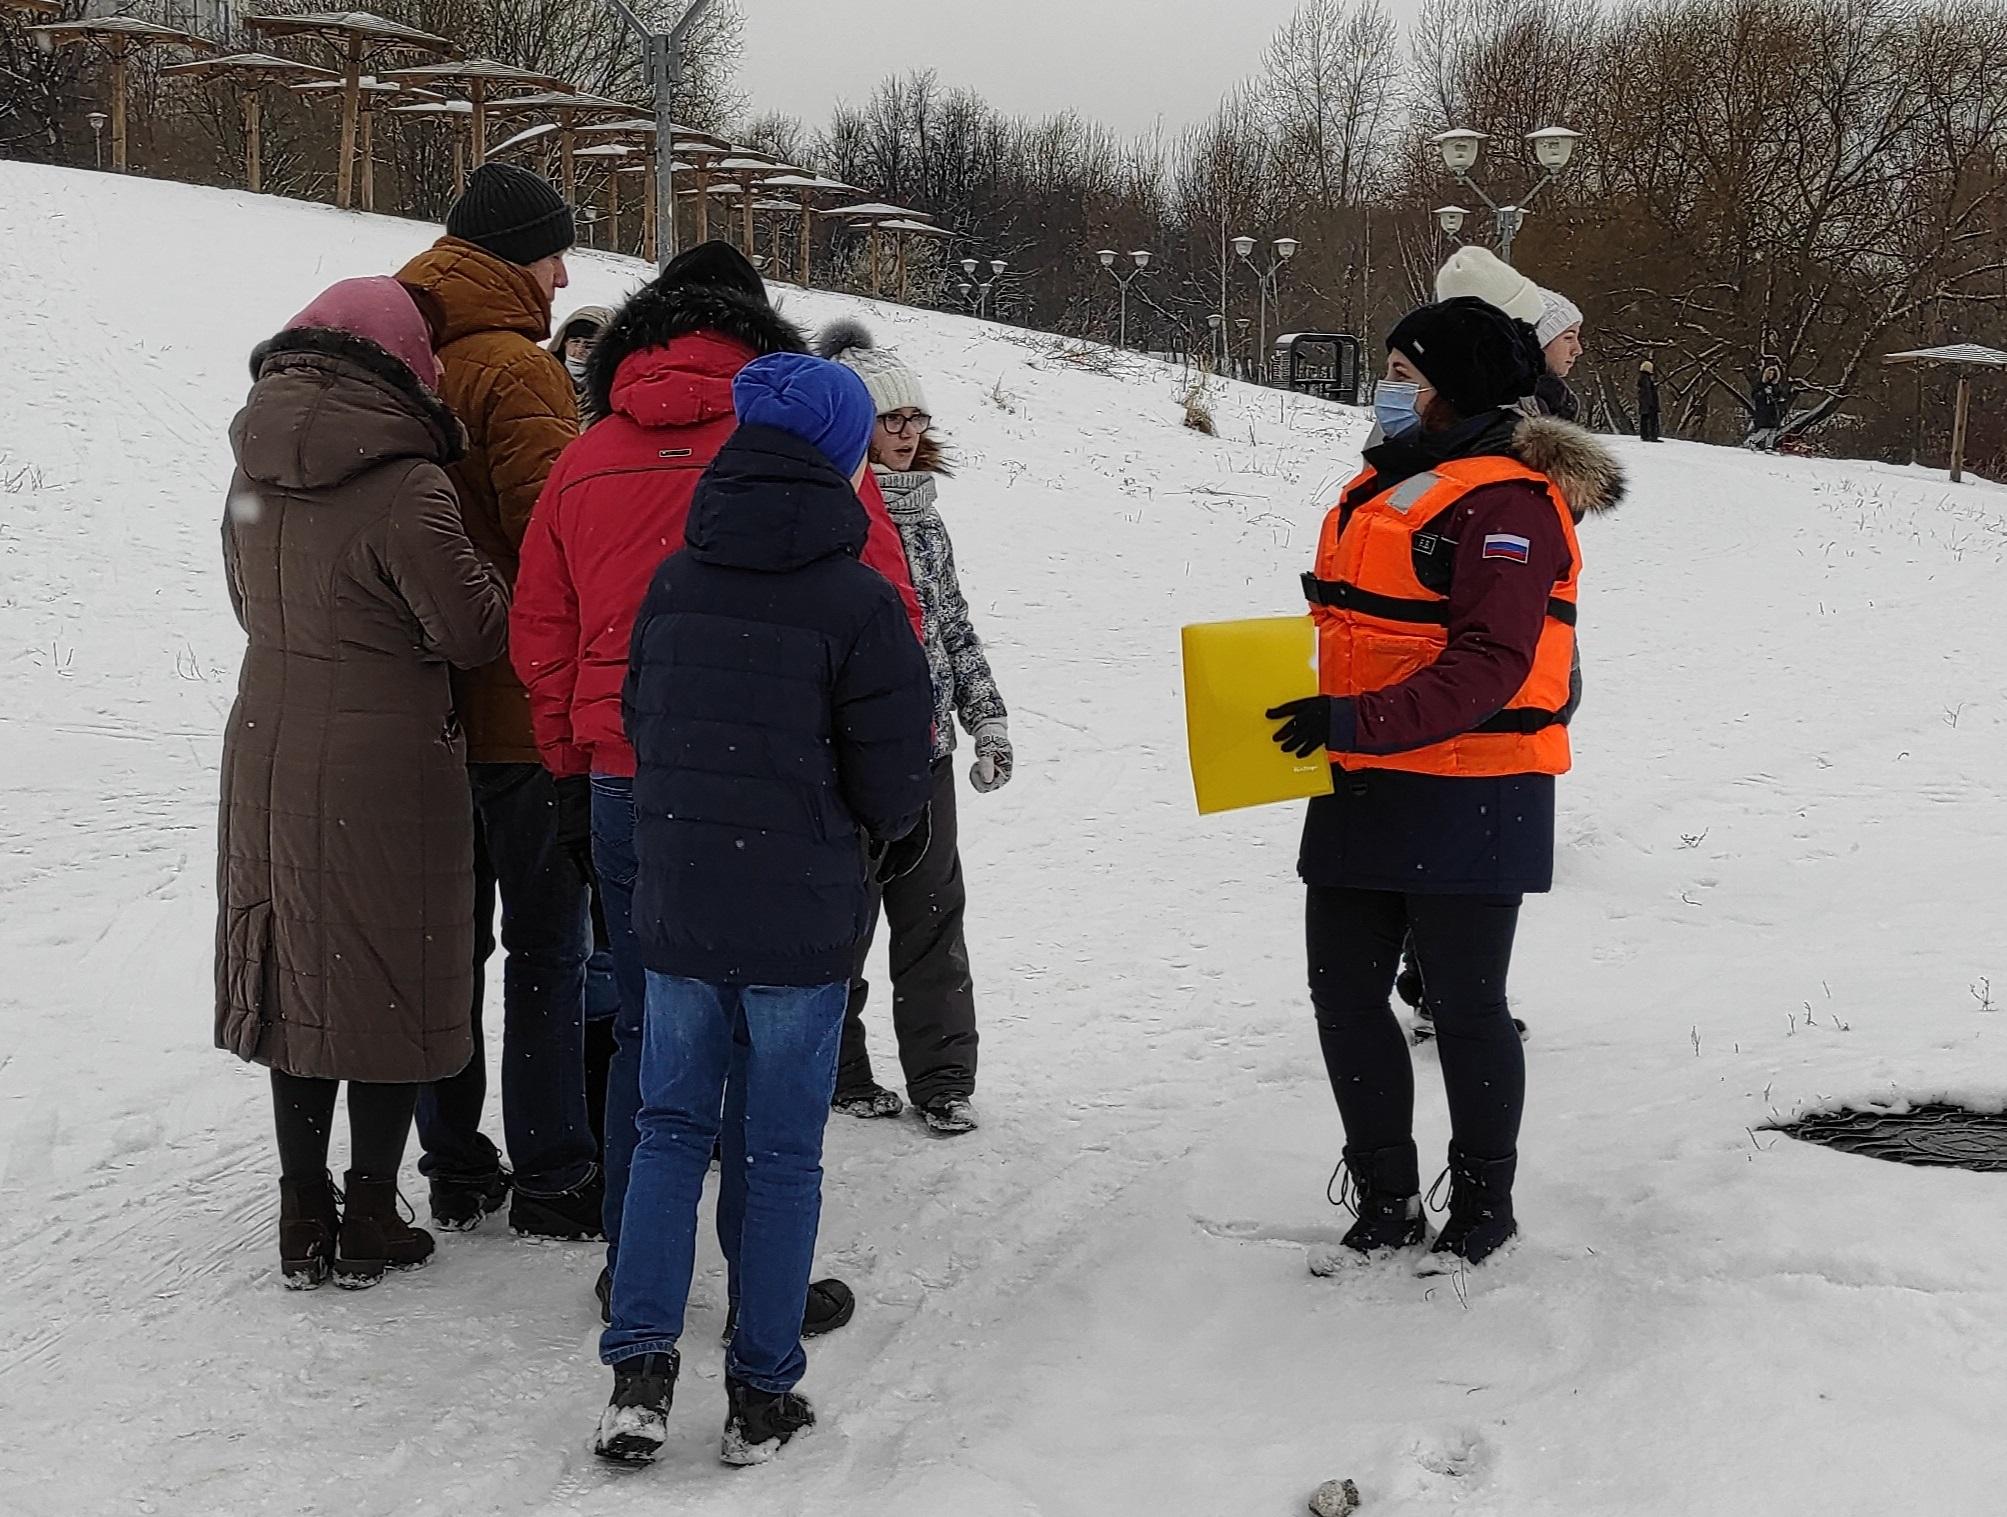 Сотрудники Управления по ЮАО Департамента ГОЧСиПБ стоят на страже безопасности населения